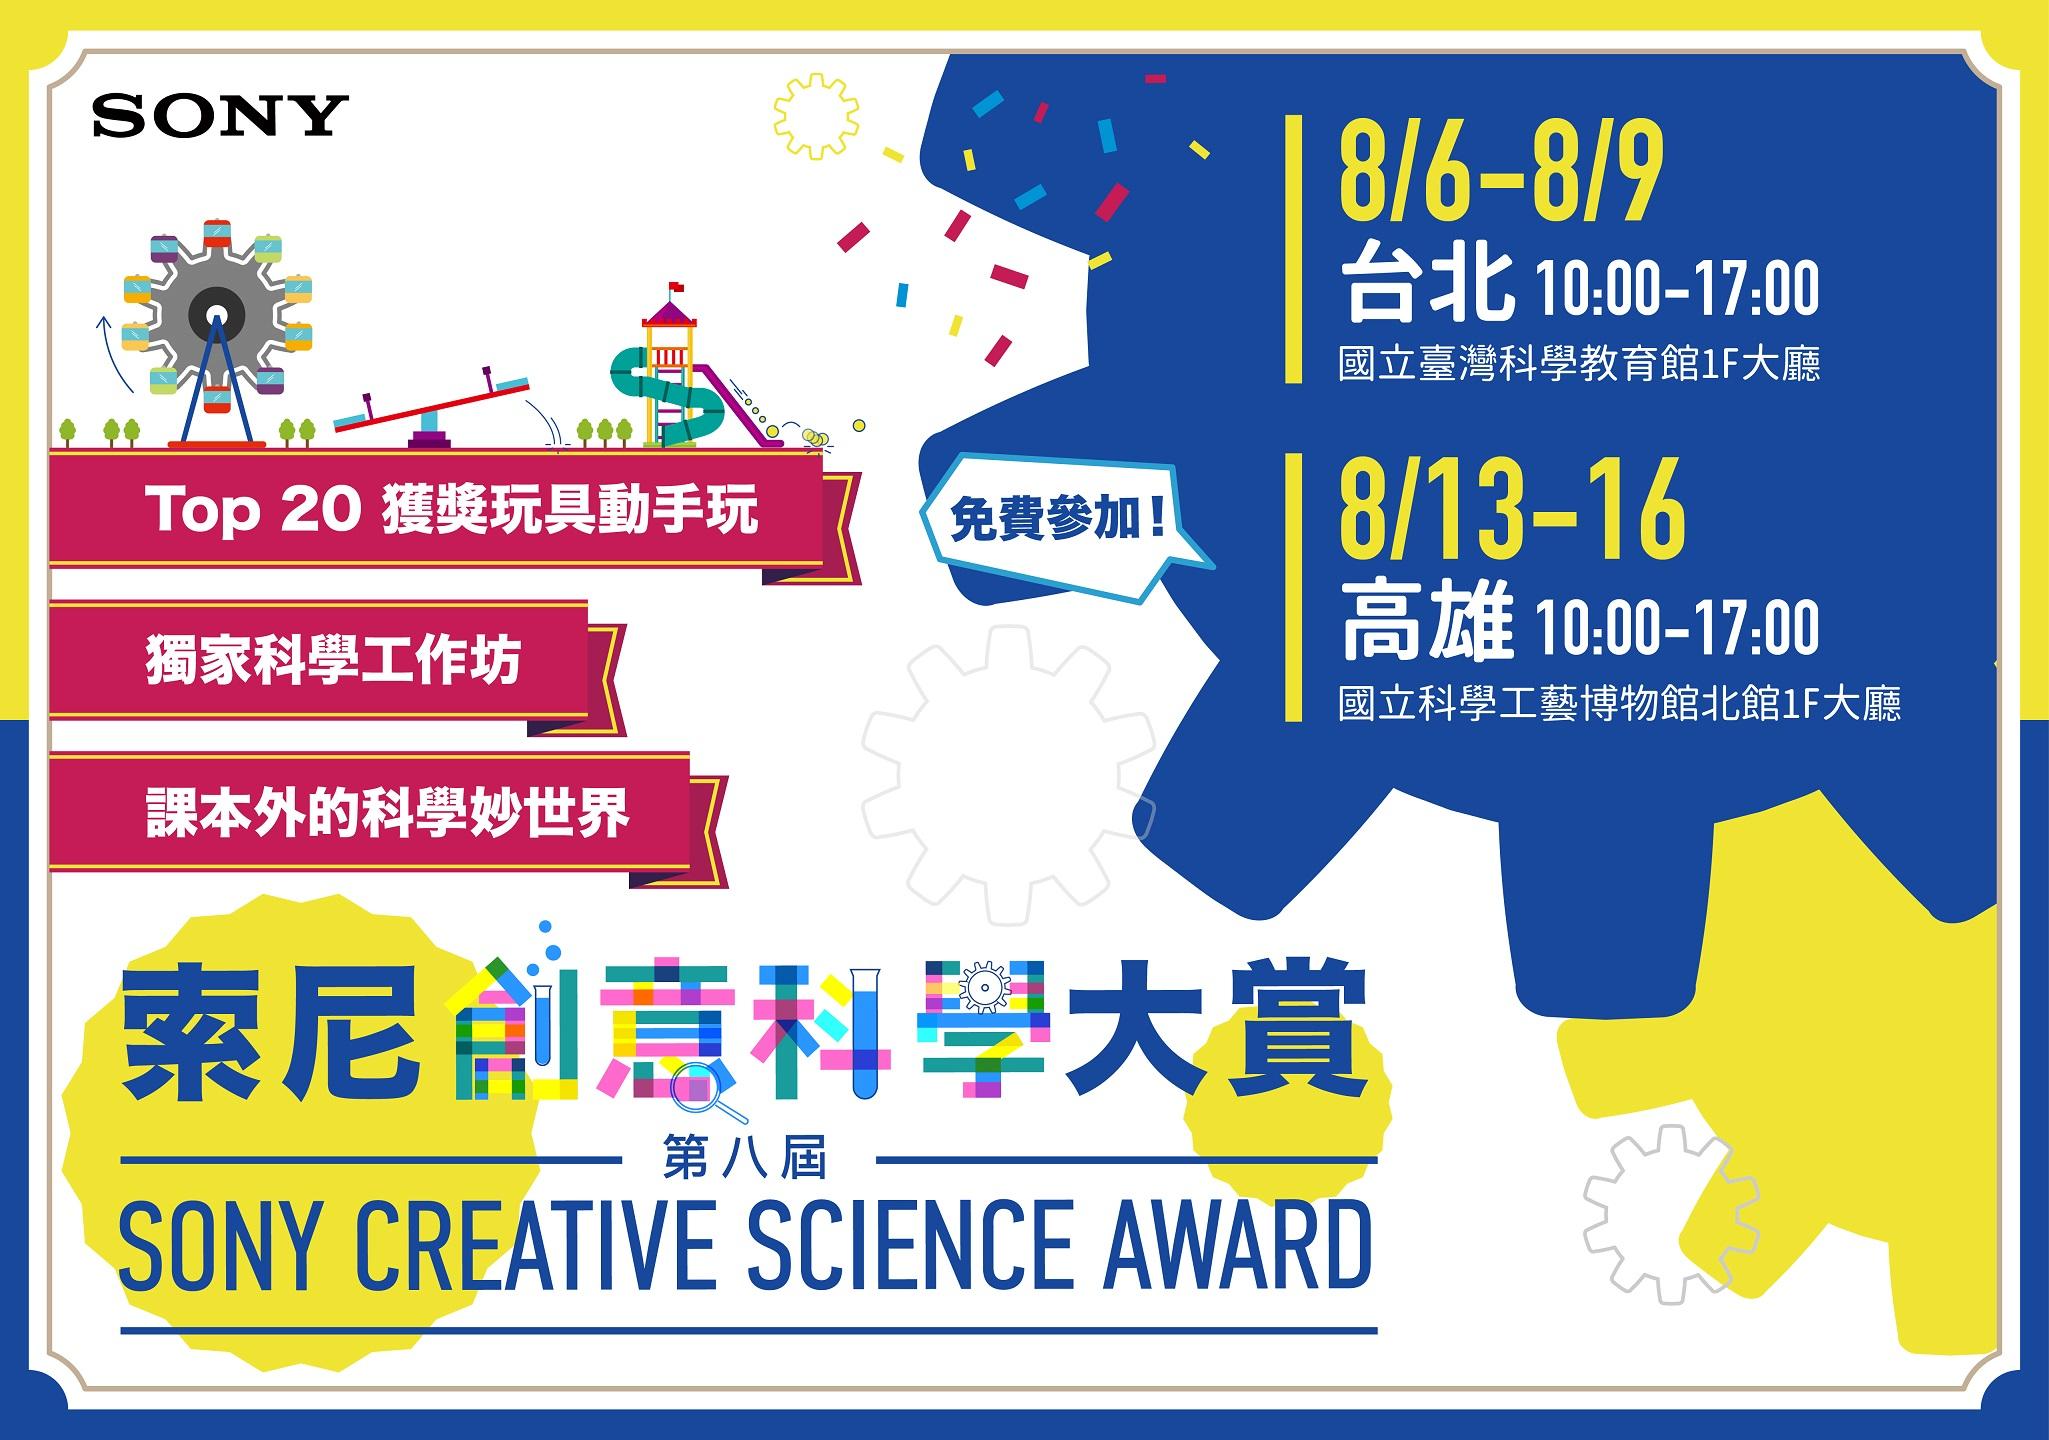 1) Sony暑假限定力學遊樂園開幕倒數計時!第八屆索尼創意科學大賞Top20成果展免費北高展出!